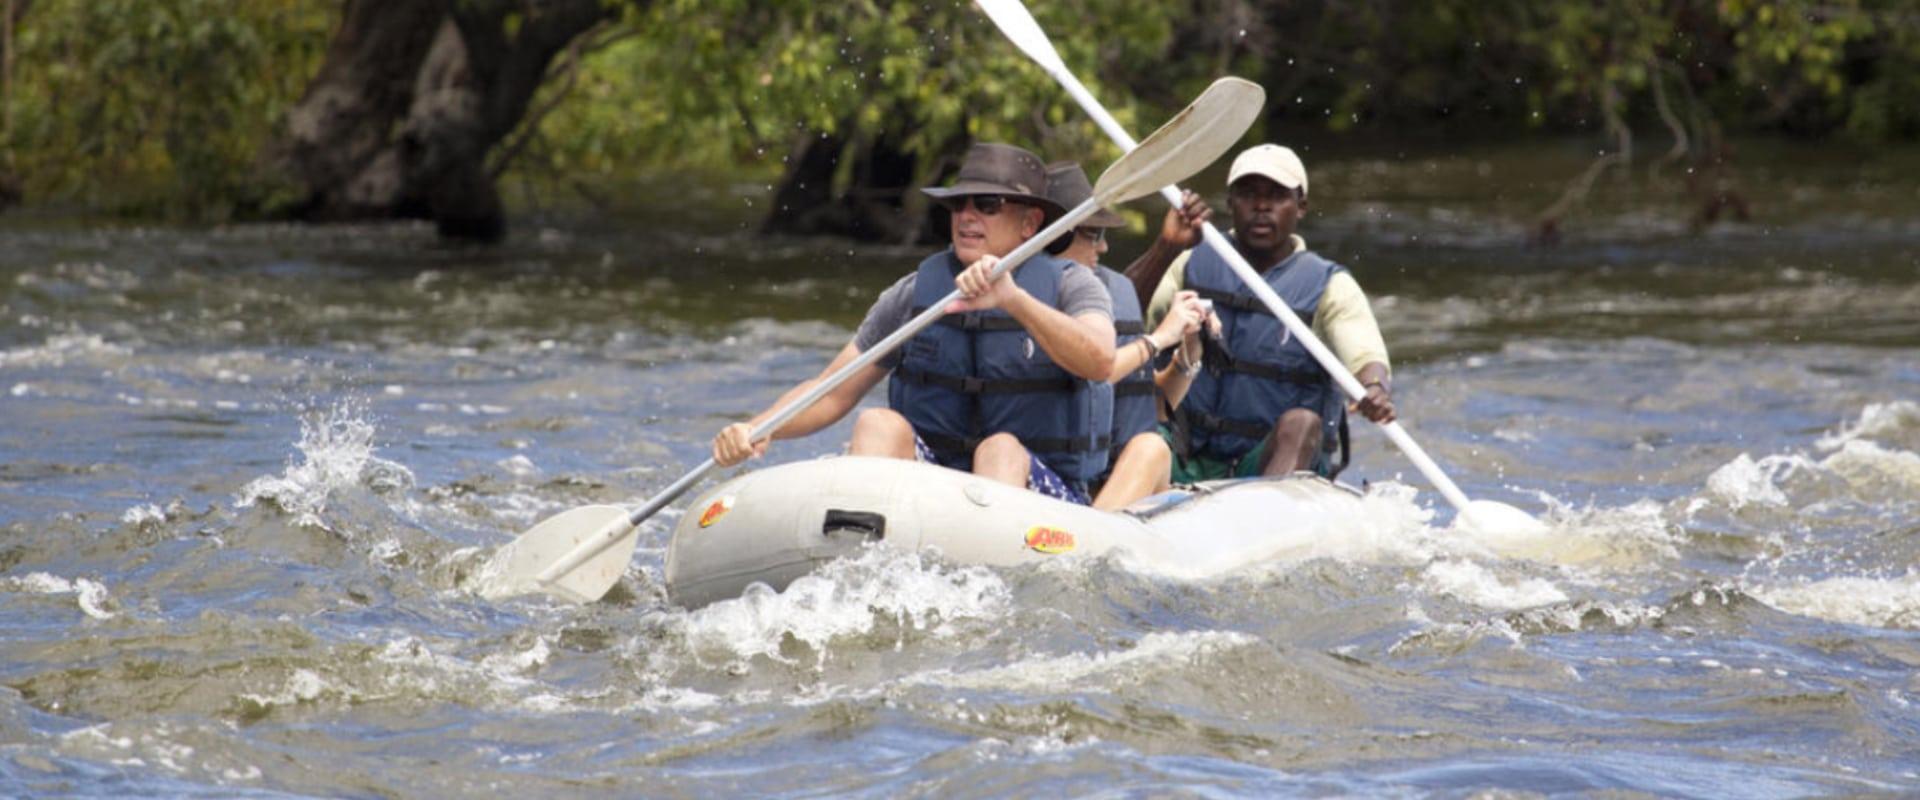 Engage your adventurous spirit as you canoe the Zambezi